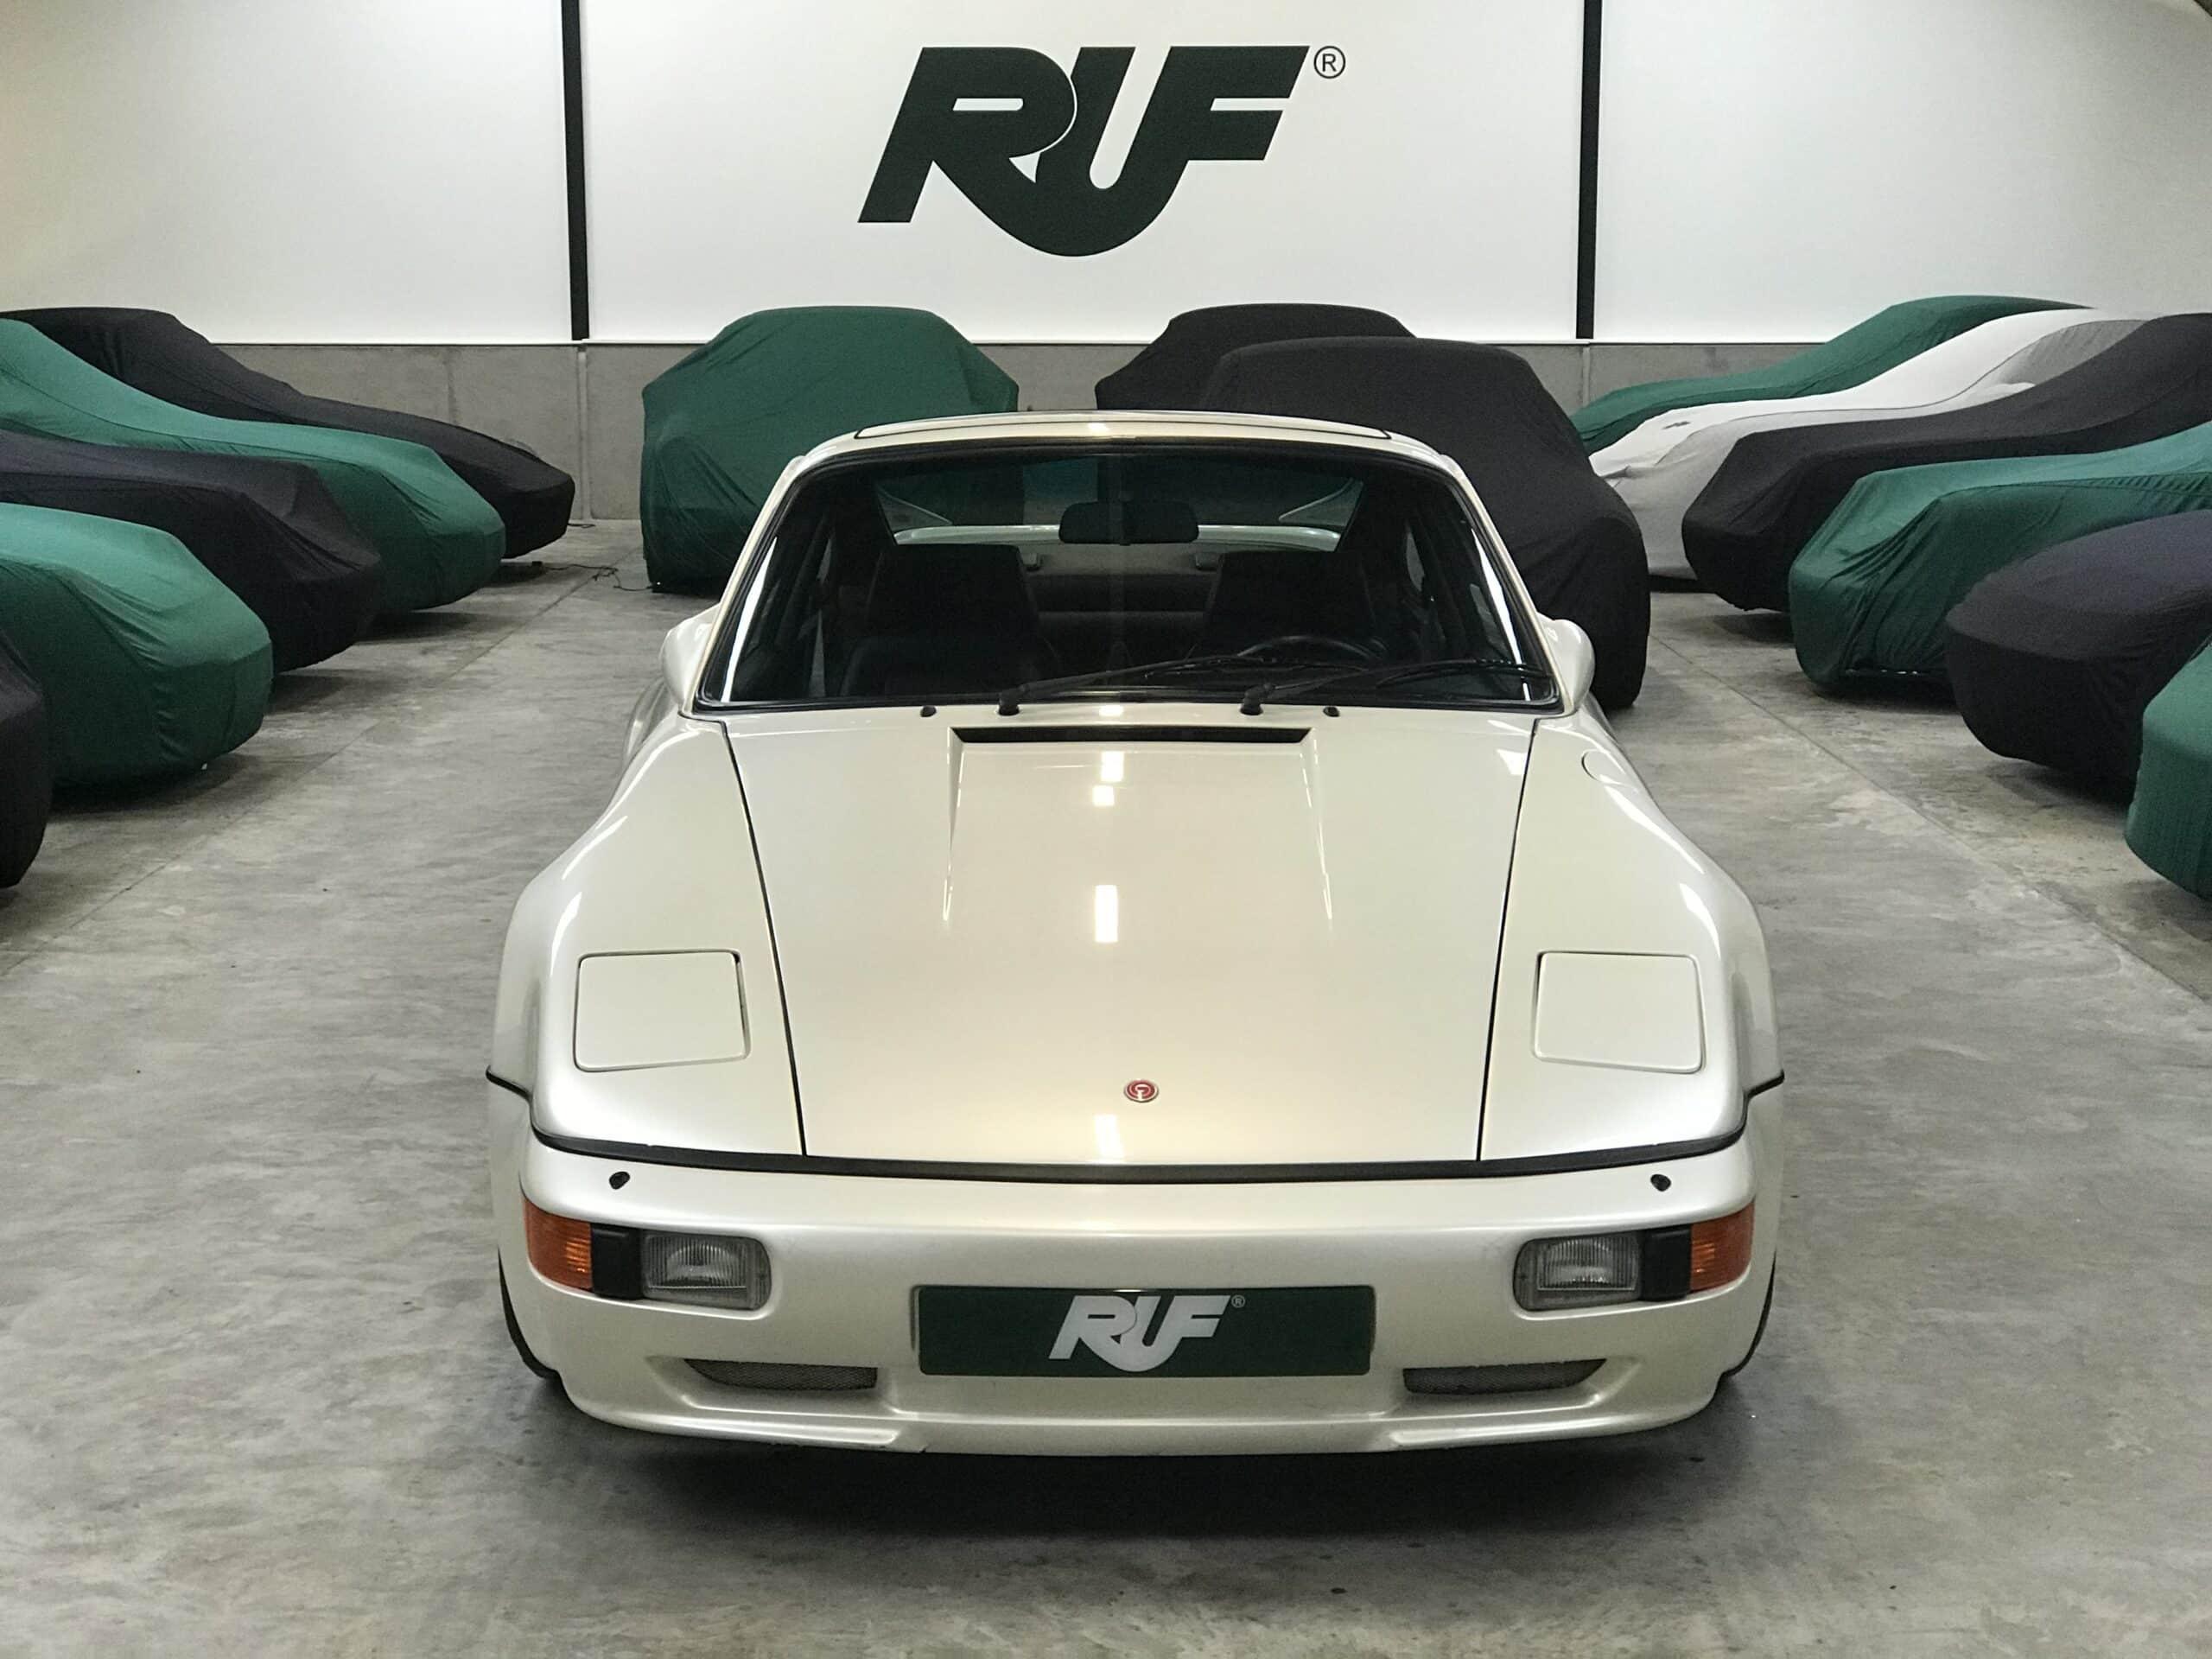 1986 Gemballa Avalanche – RUF 3.4L Turbo – Only 14k Miles – RUF Dogleg Transmission